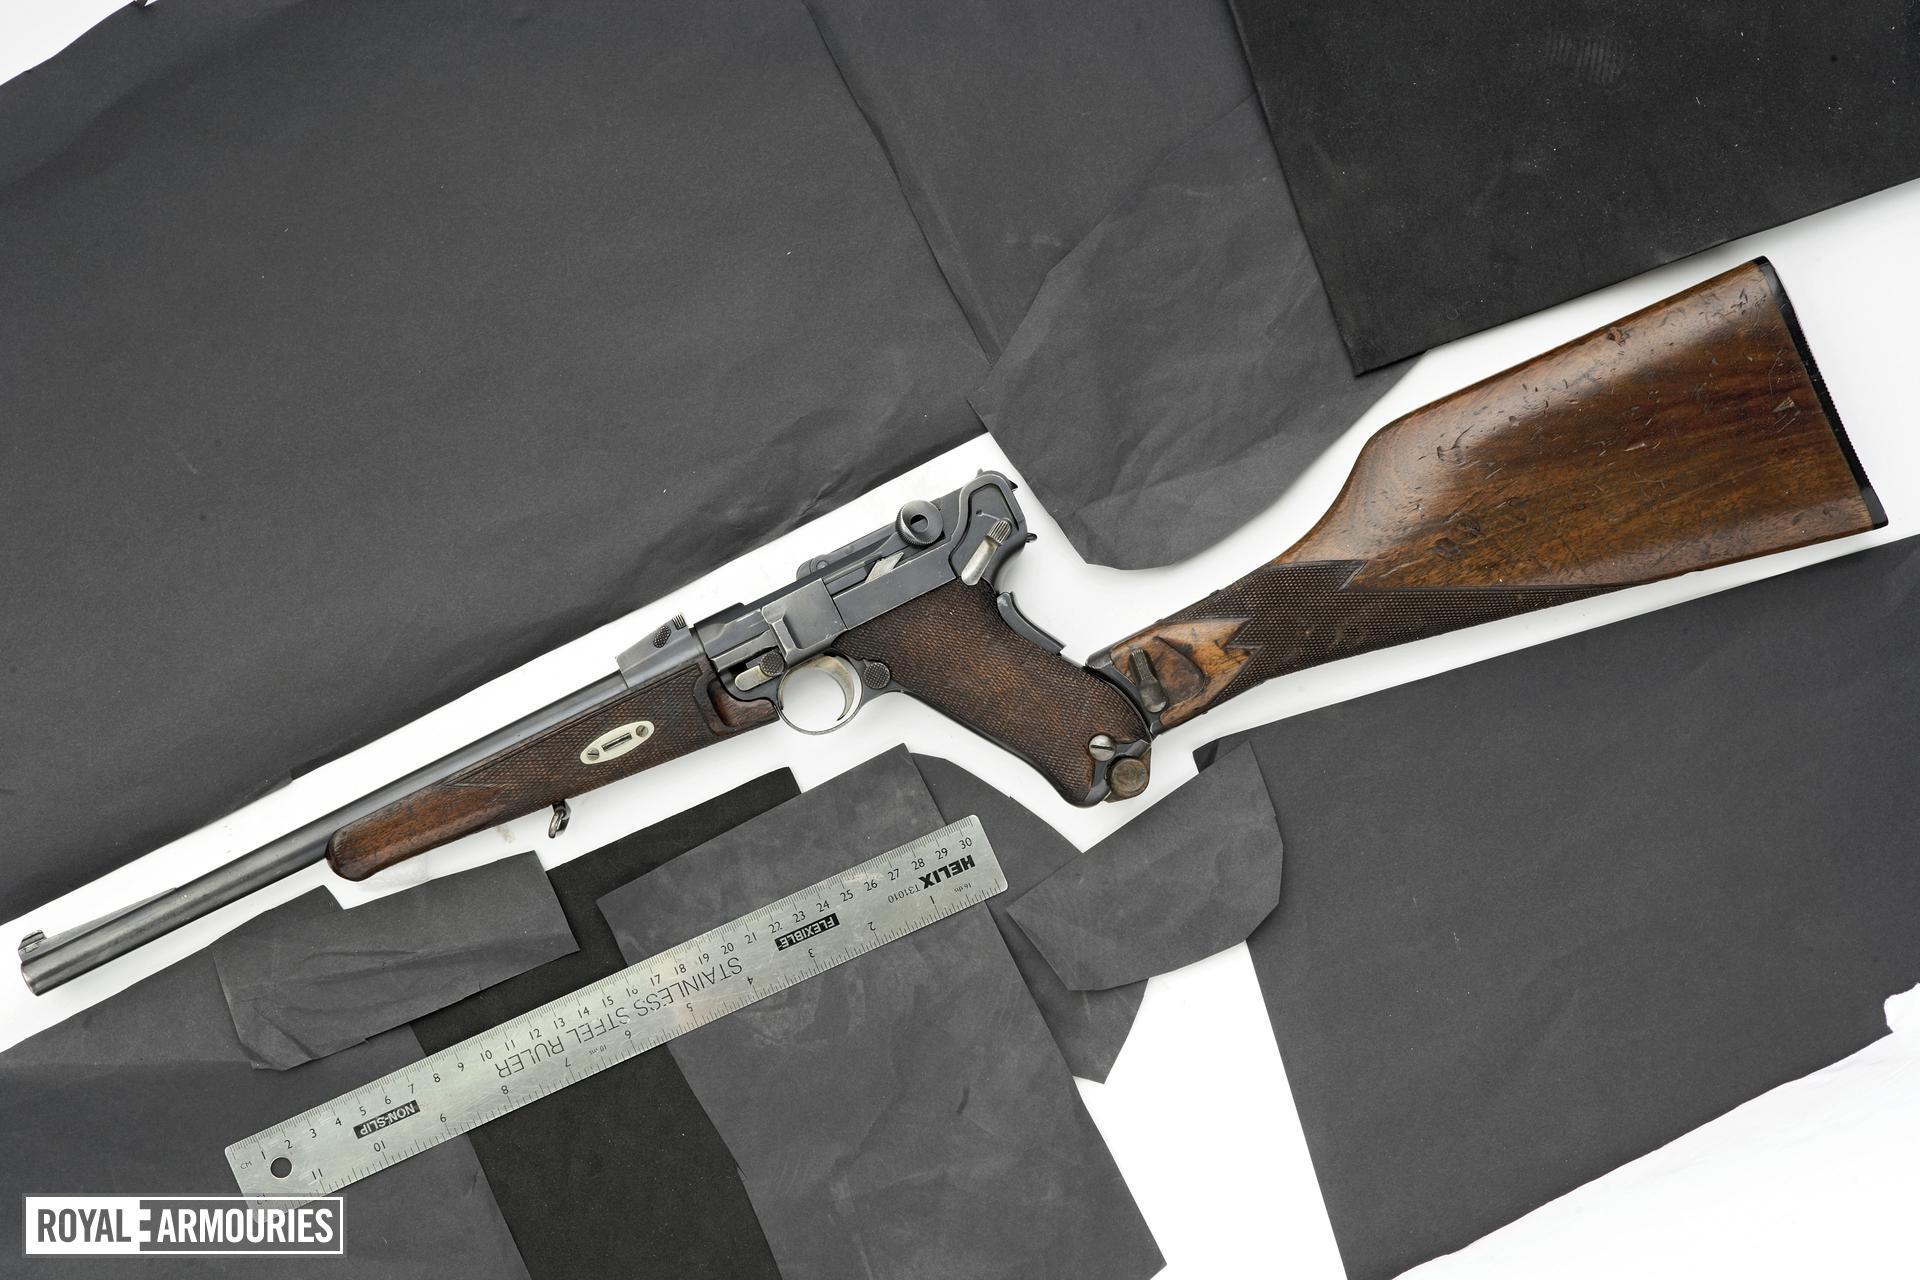 Centrefire self-loading pistol carbine - Luger Model 1902